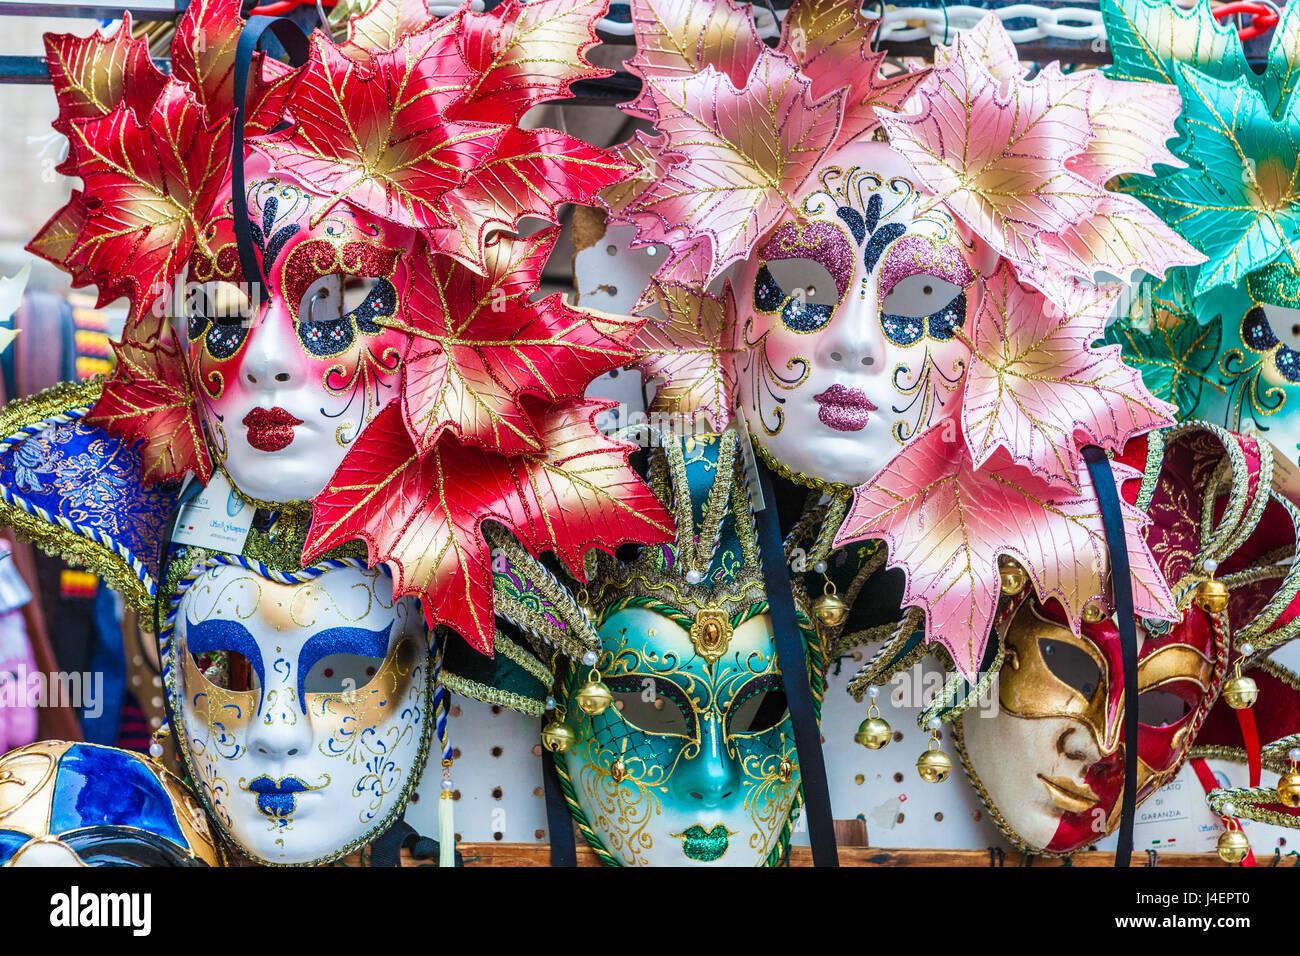 Colourful masks of the Carnival of Venice, famous festival worldwide, Venice, Veneto, Italy, Europe - Stock Image